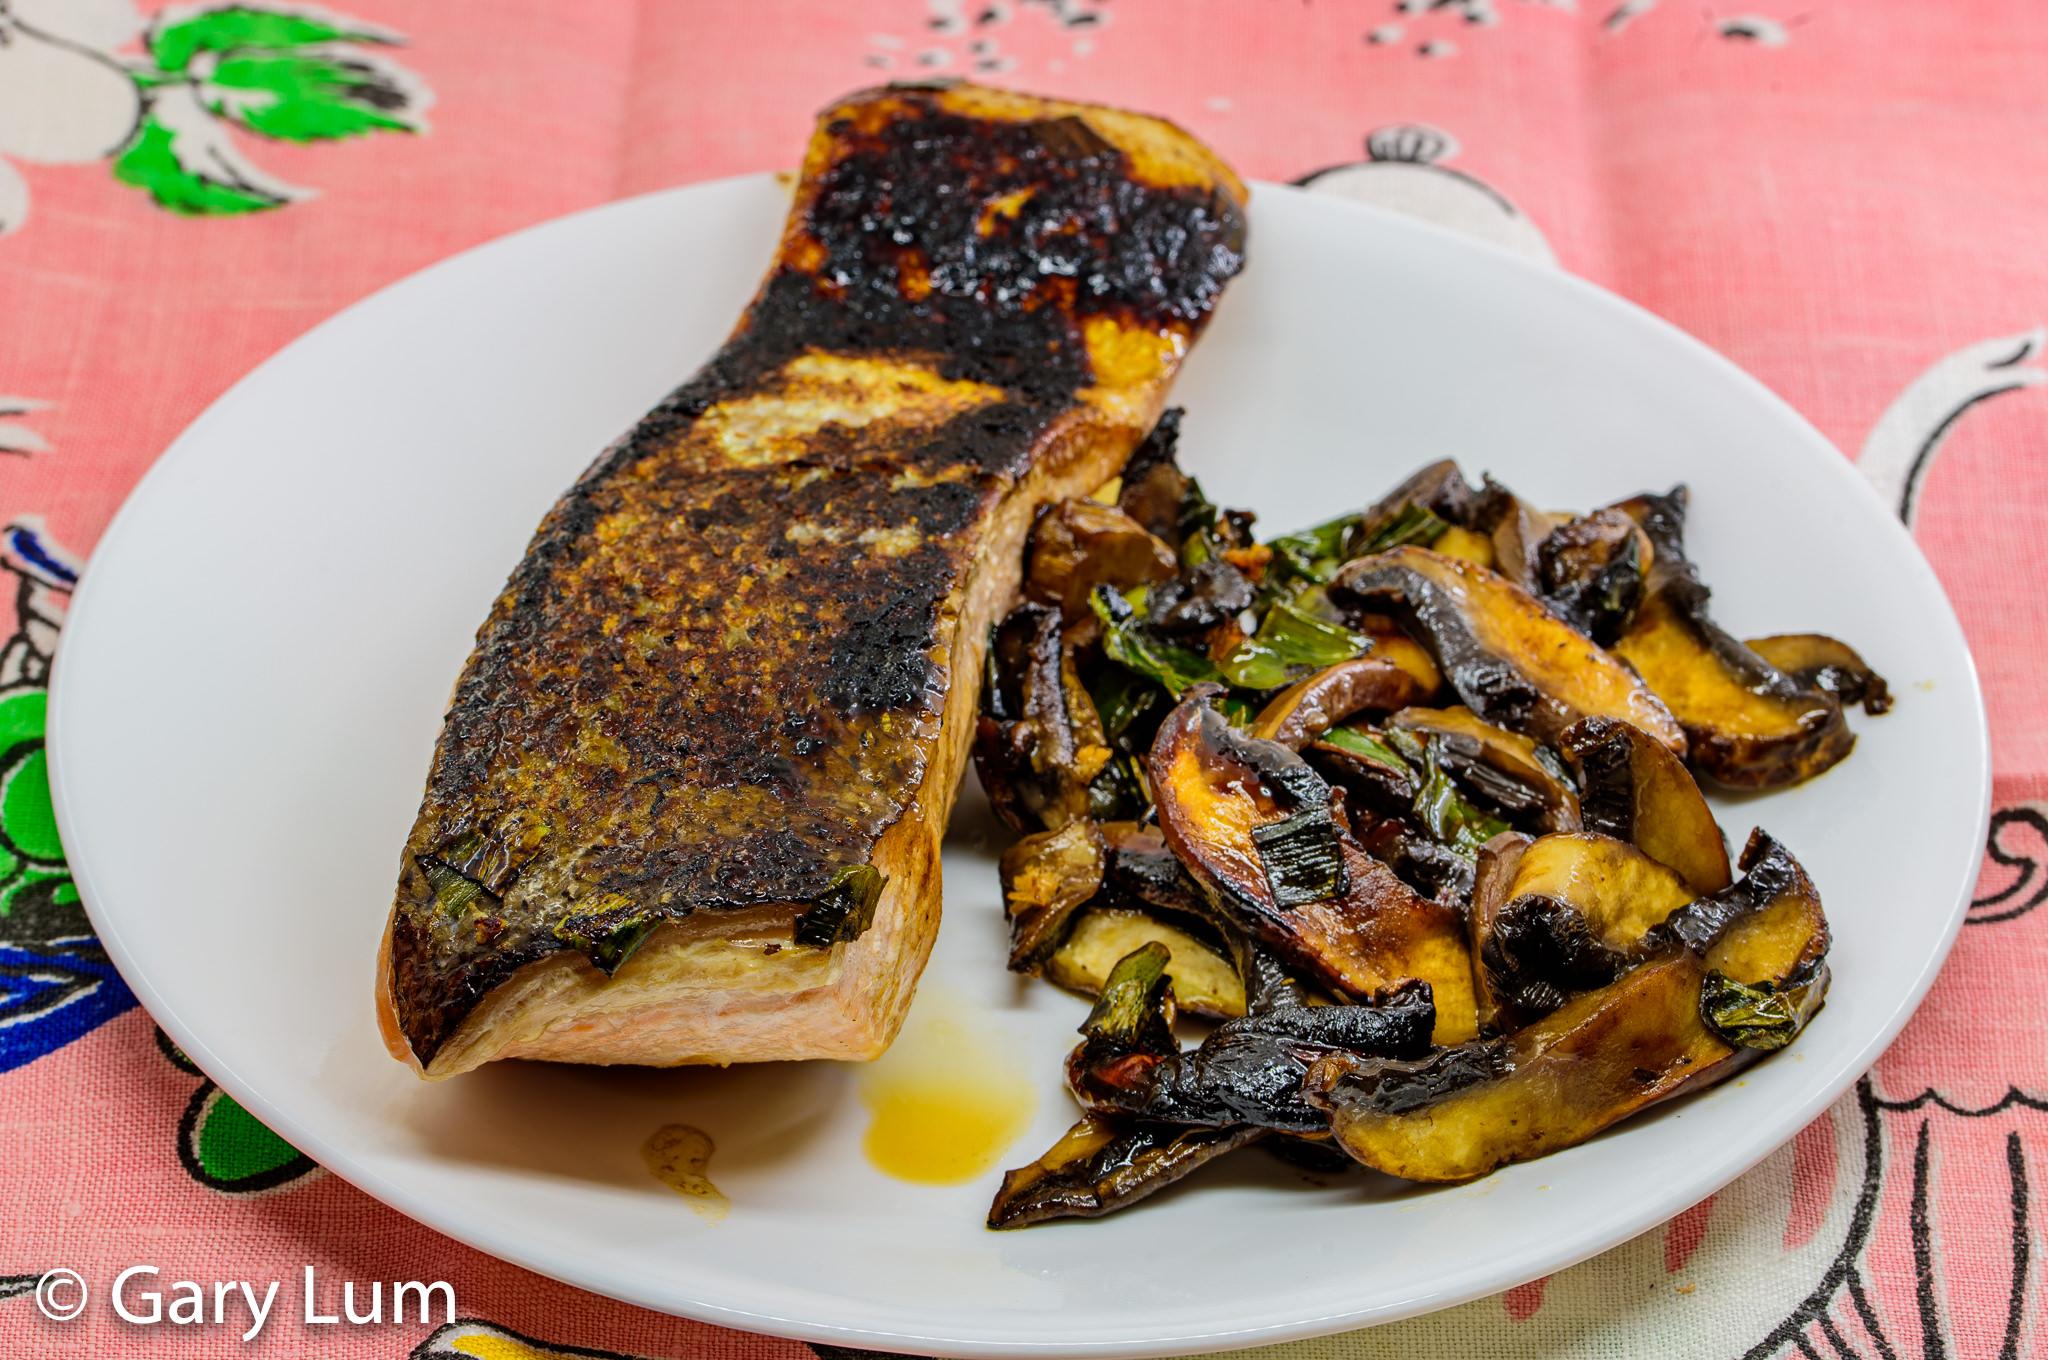 Pan-fried salmon with butter mushrooms. Gary Lum.